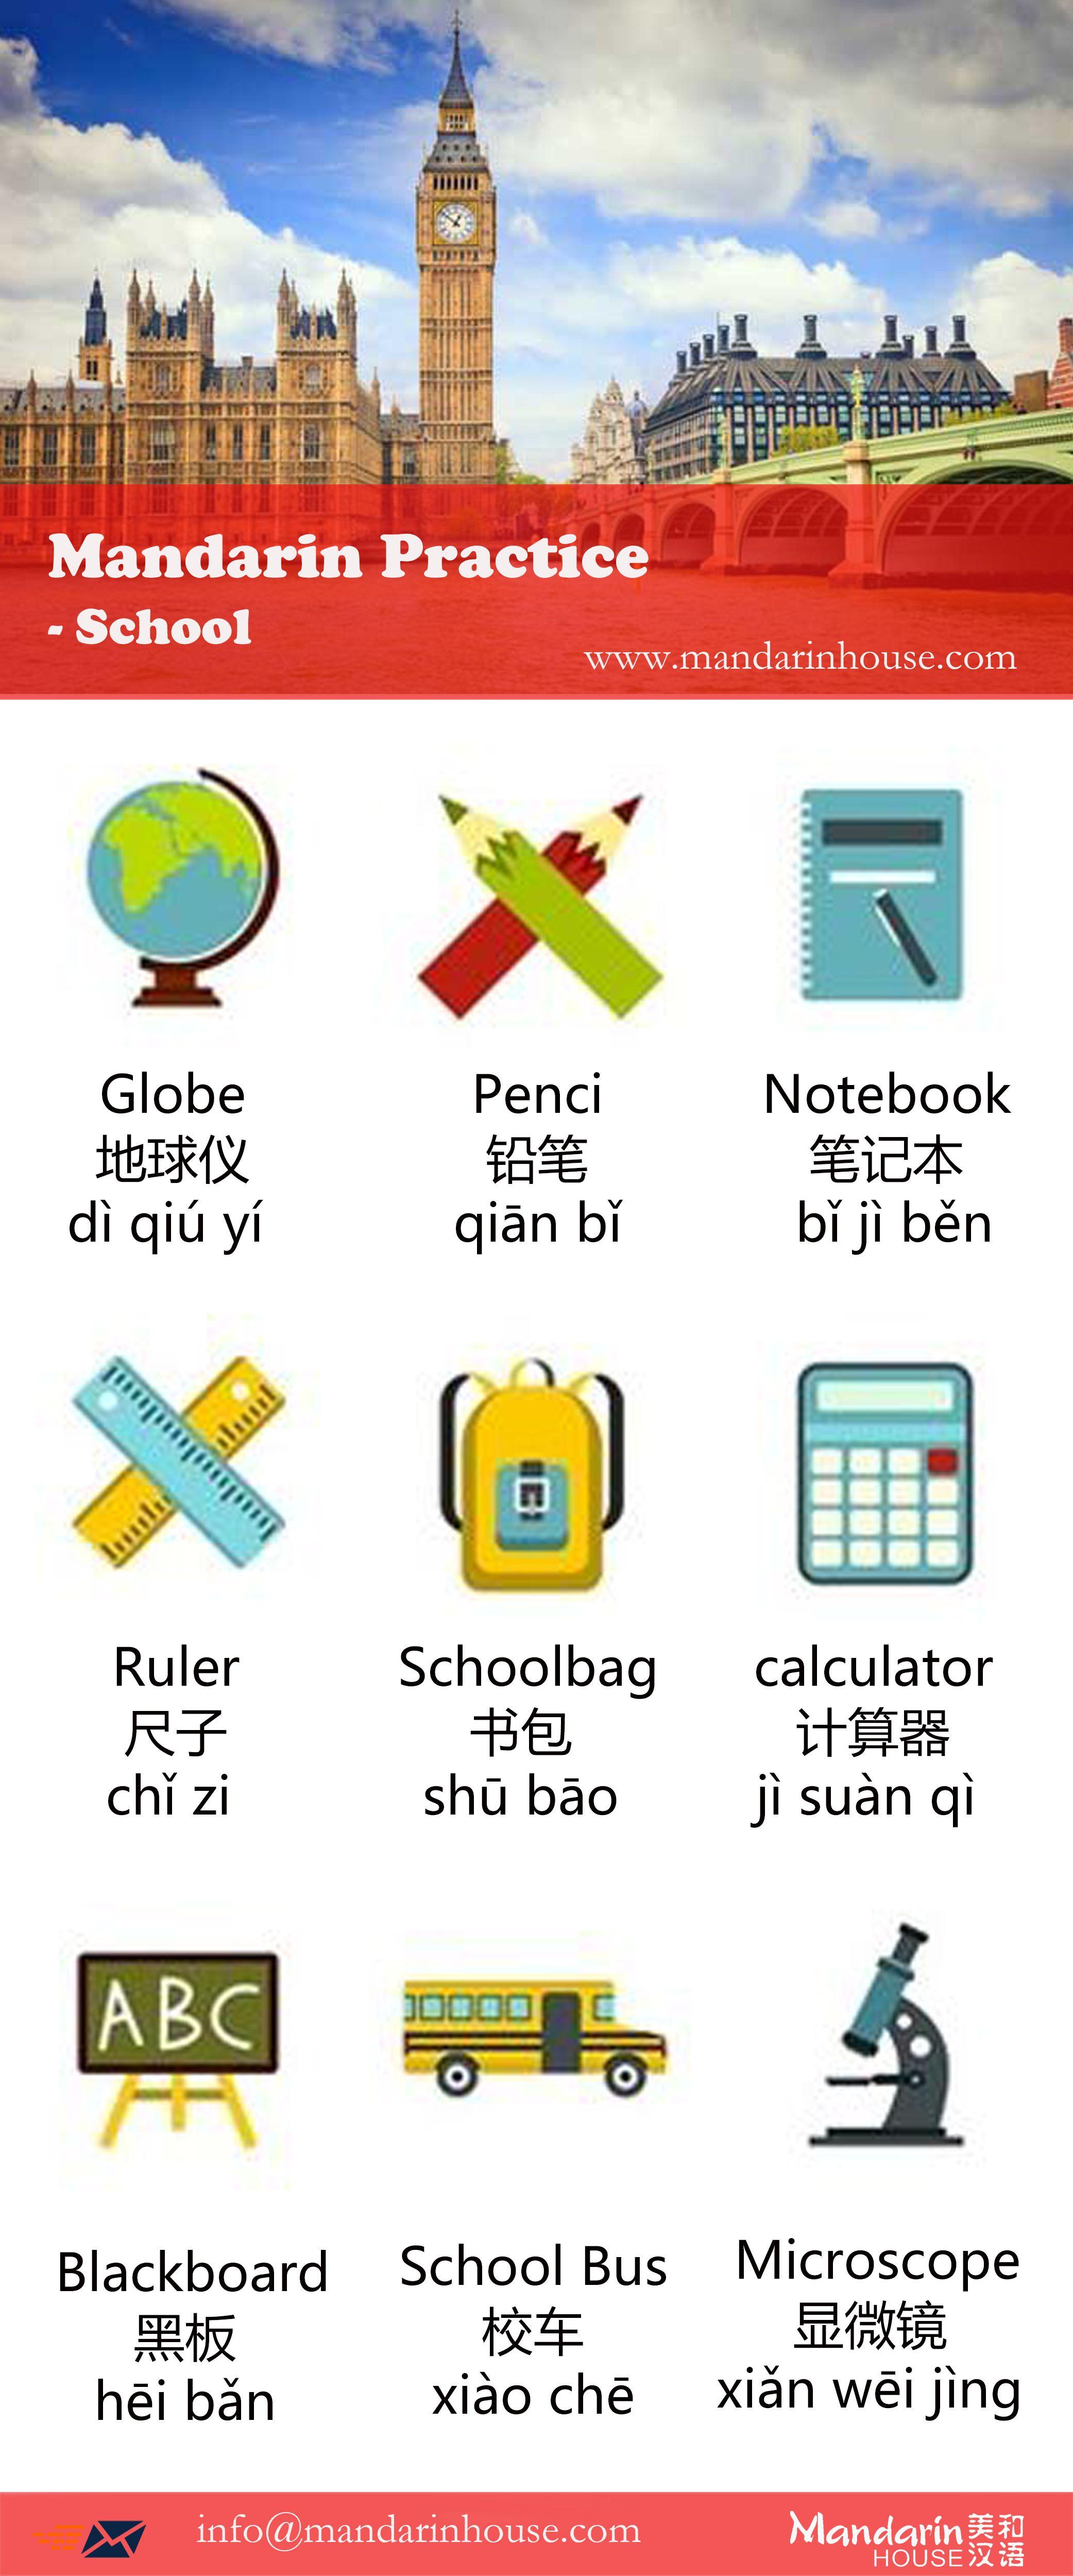 School In Chineser More Info Please Contact Bodi